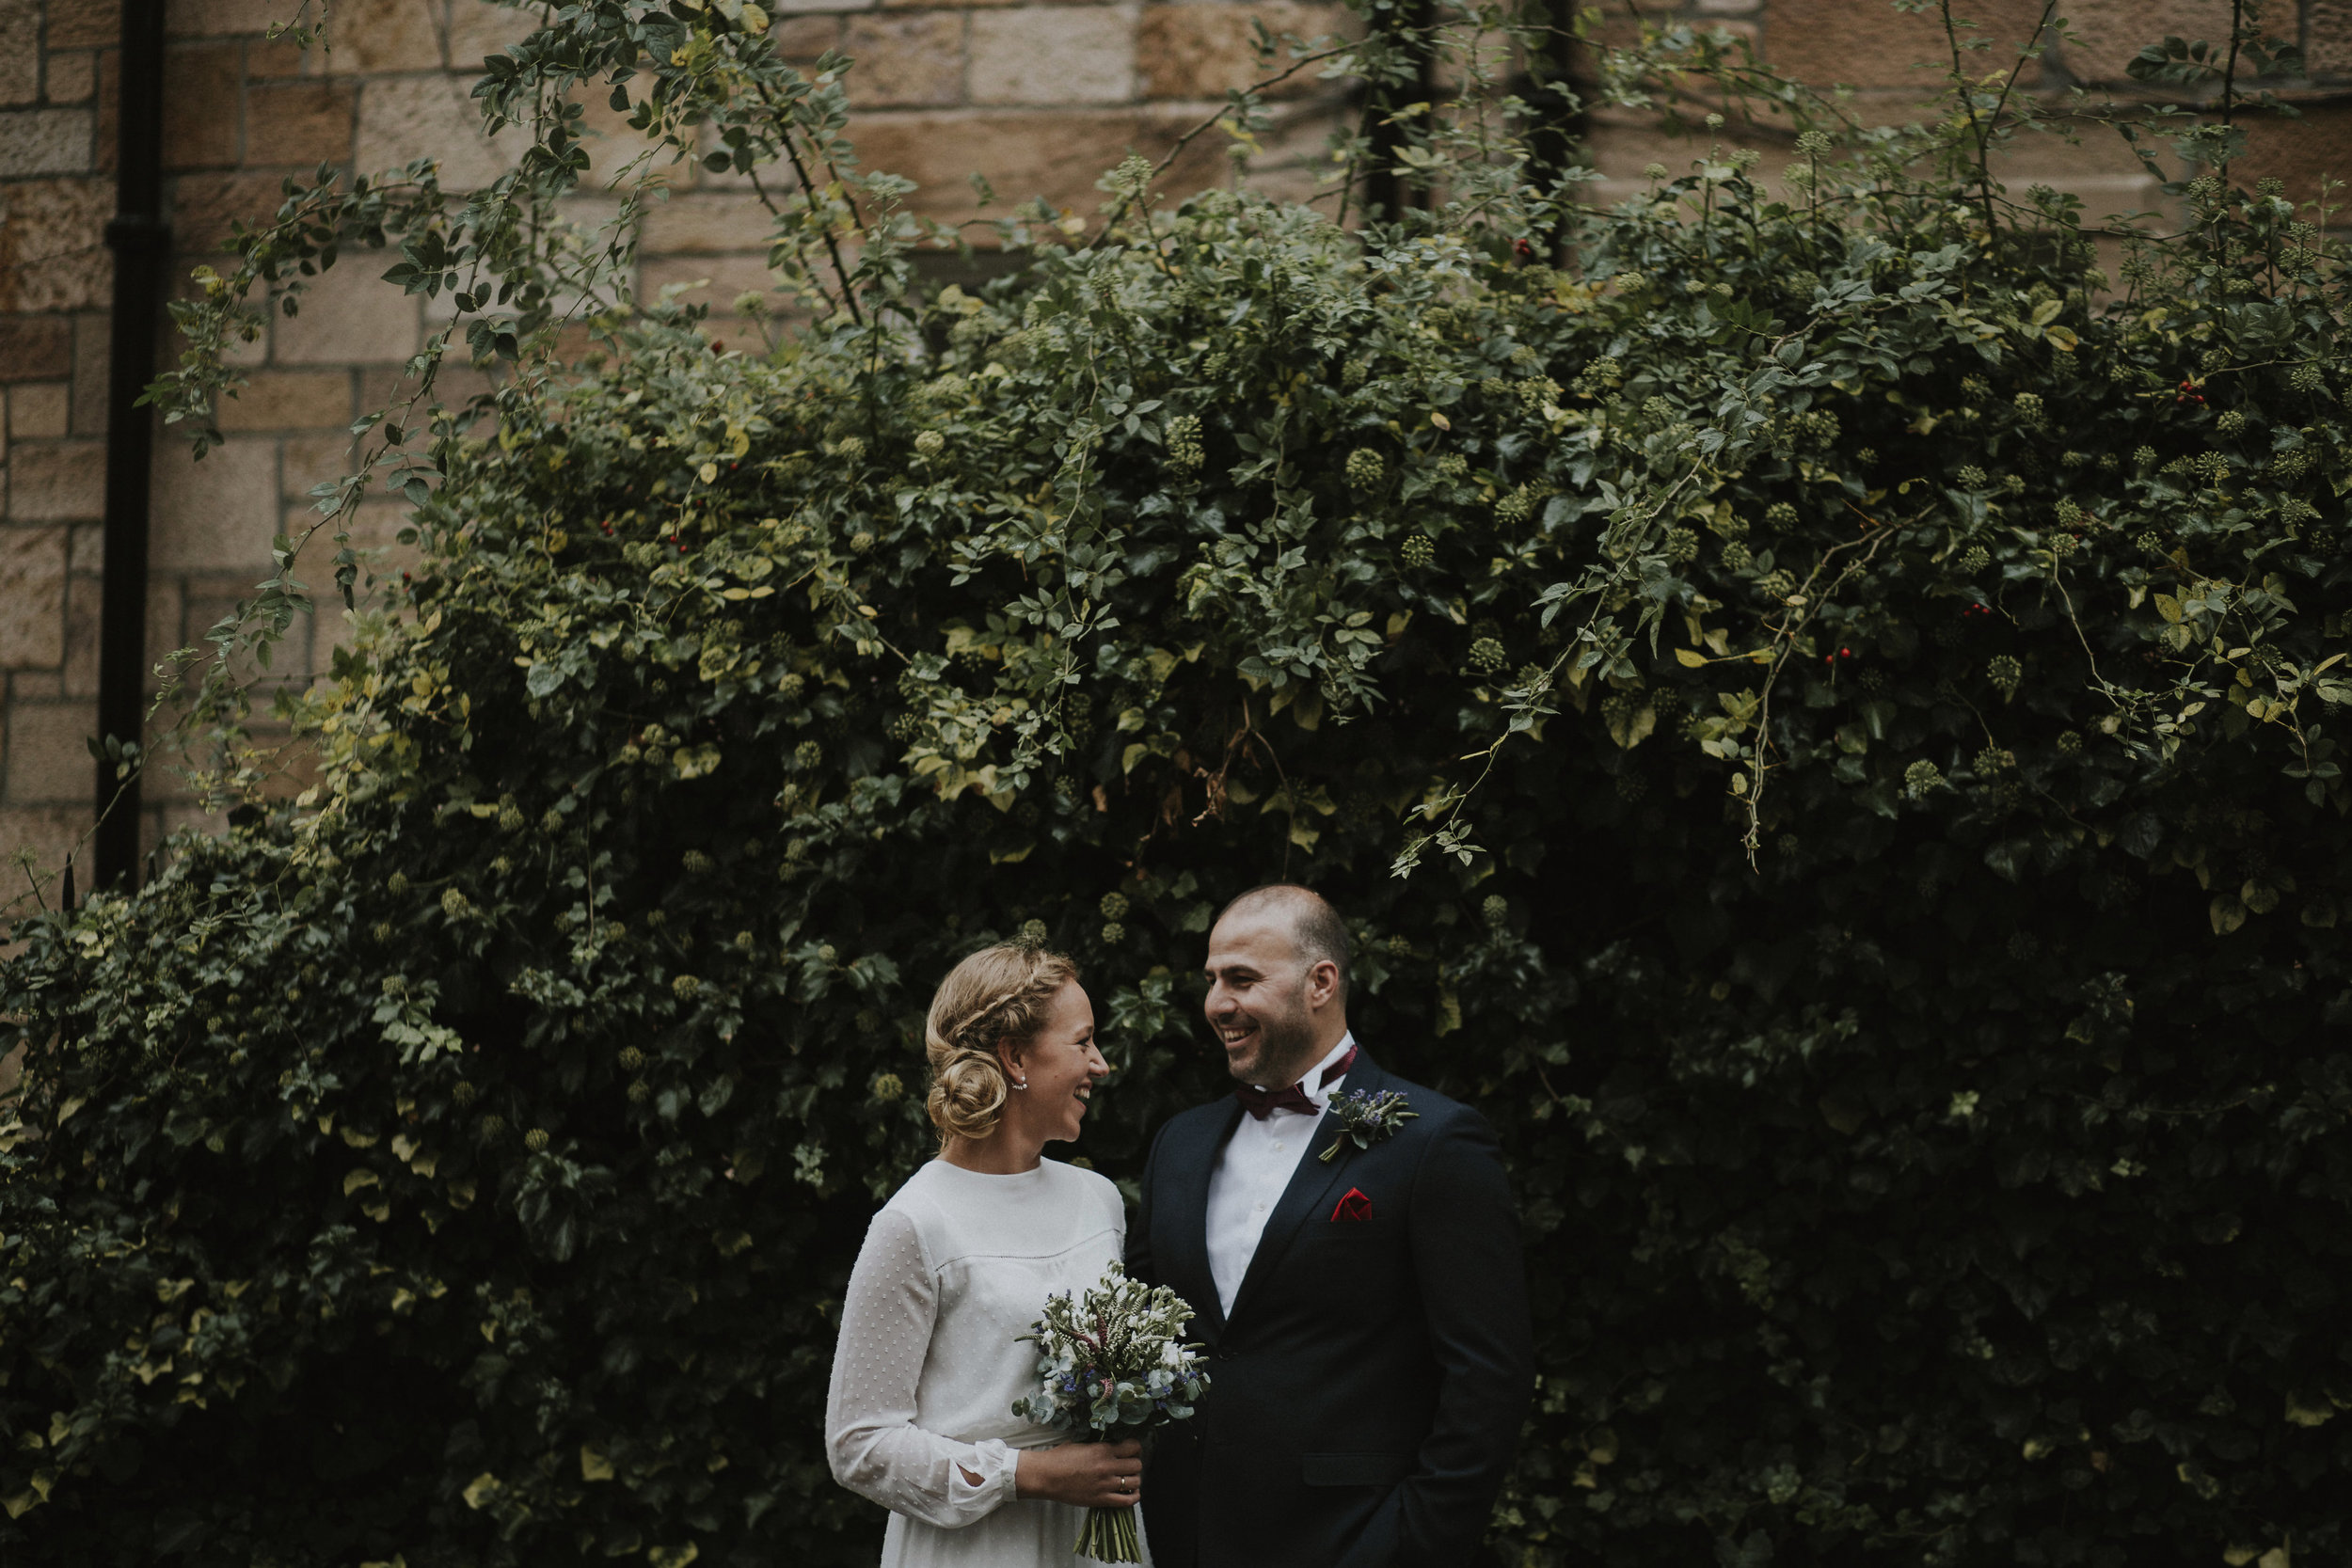 238_wedding_photography_edinburgh.jpg